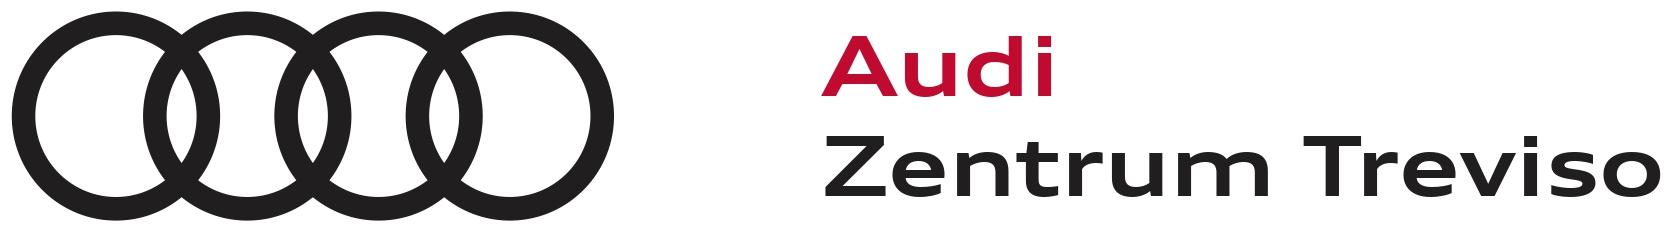 Audi Zentrum Treviso